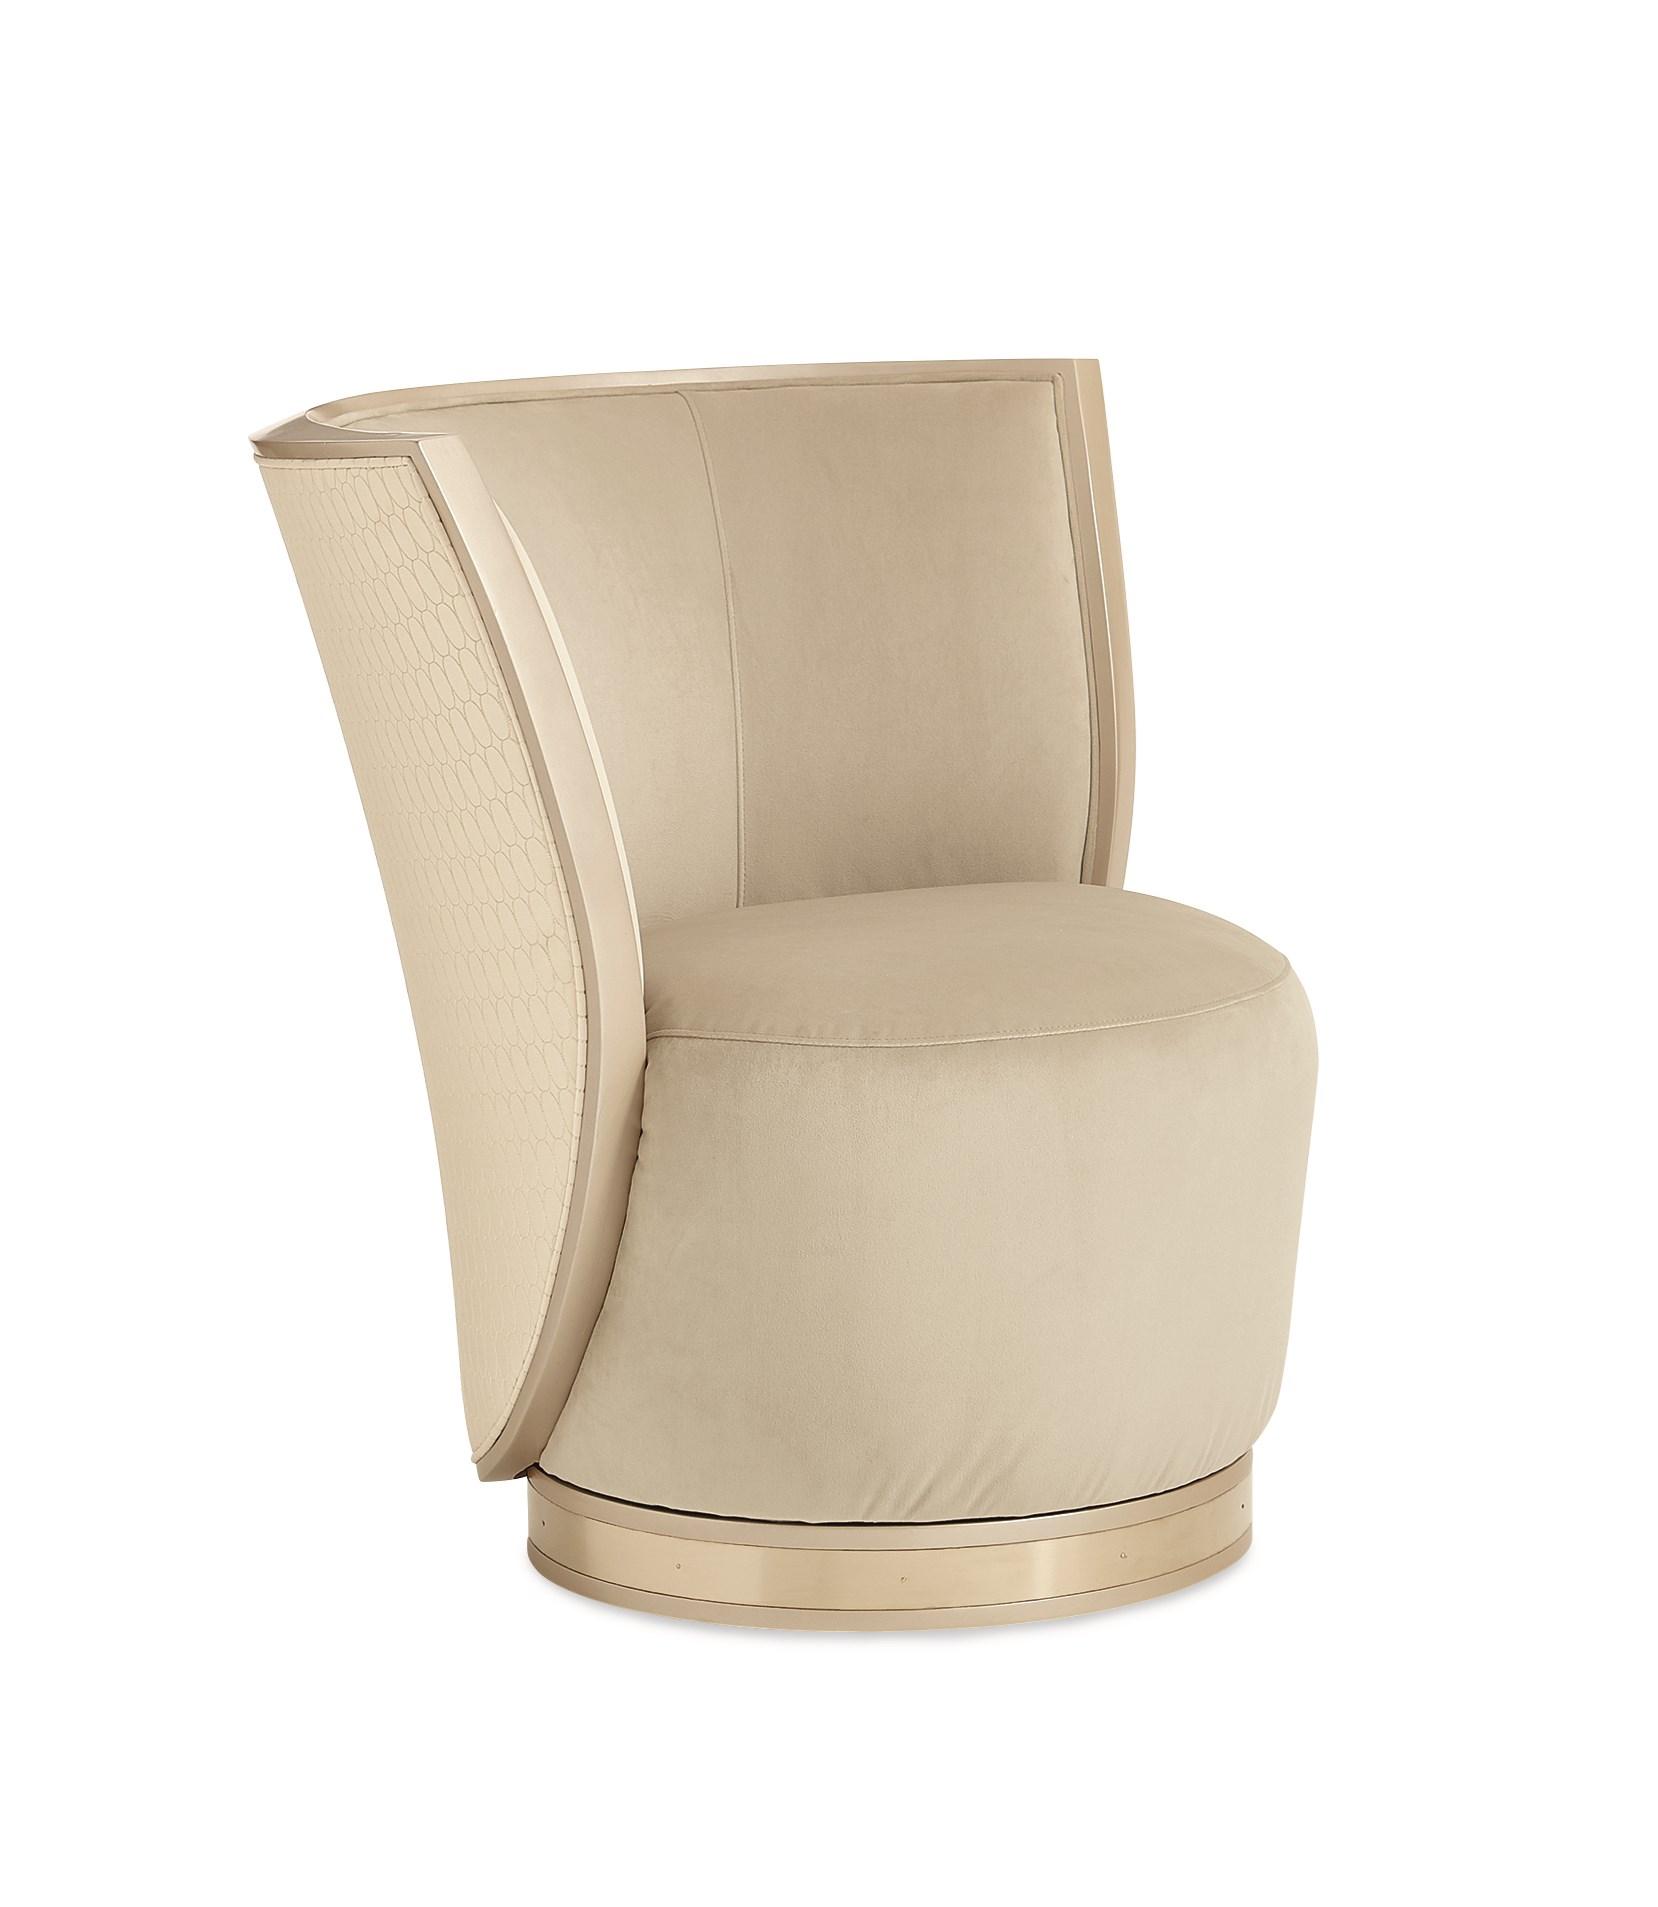 Awesome U Turn Caracole Evergreenethics Interior Chair Design Evergreenethicsorg